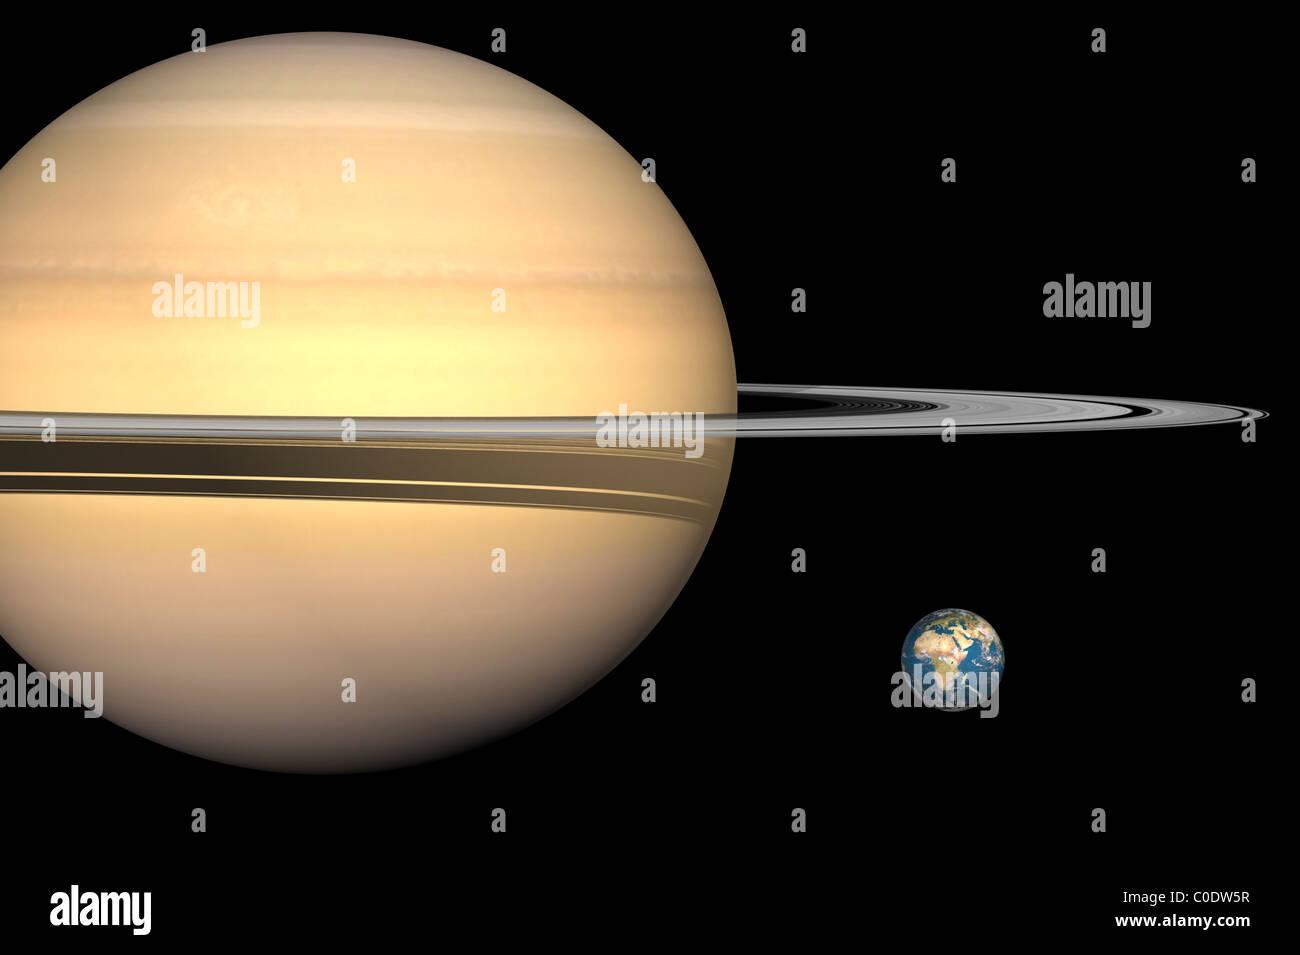 Illustration von Saturn und Erde maßstabsgetreu. Stockbild